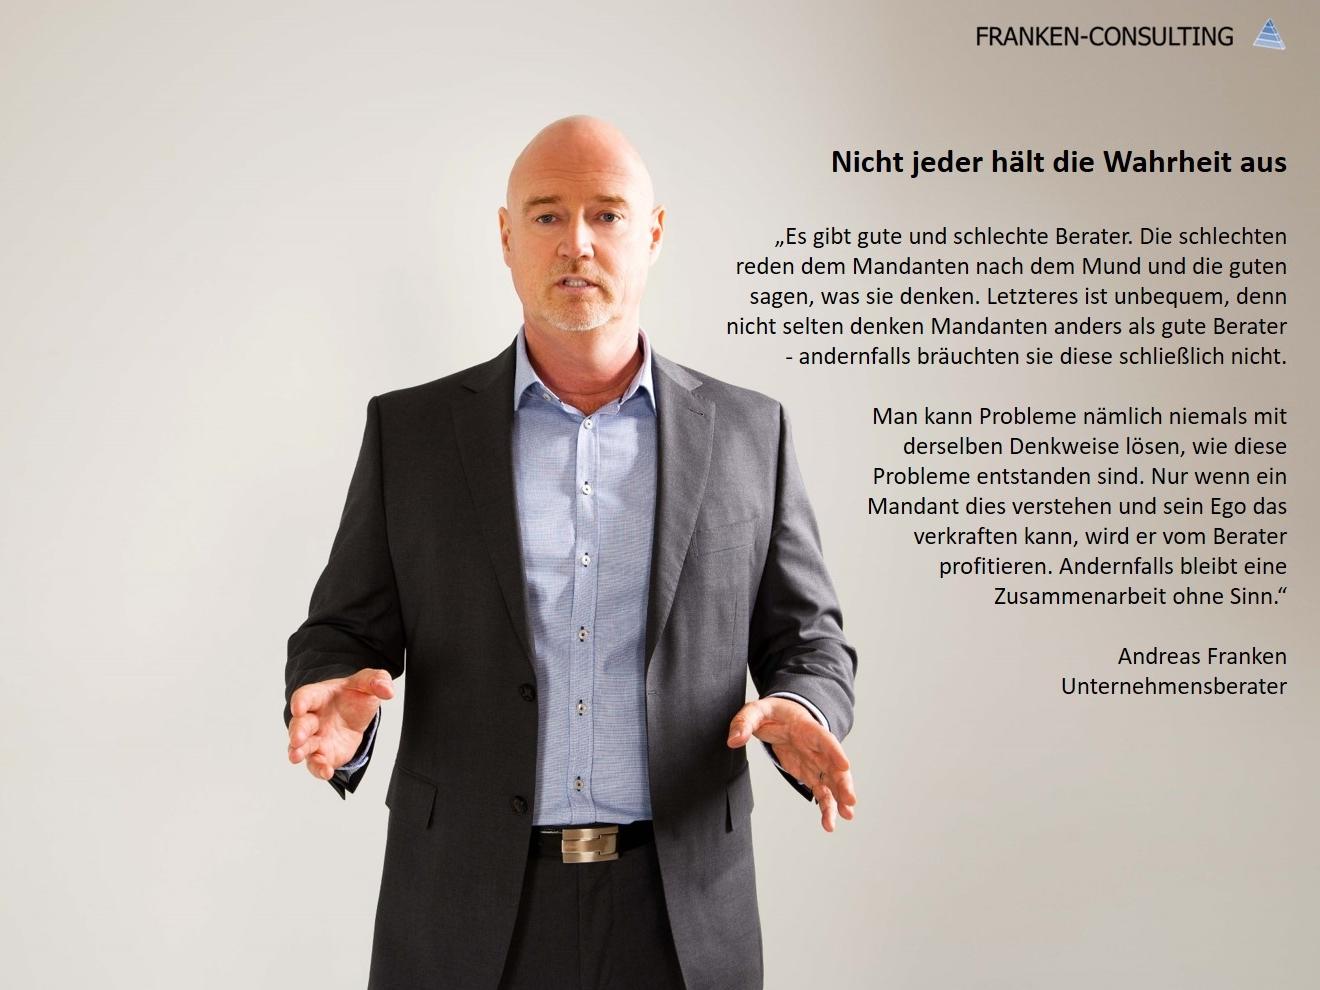 Franken-Consulting Unternehmensberatung, Vertrieb, Vertriebsberatung